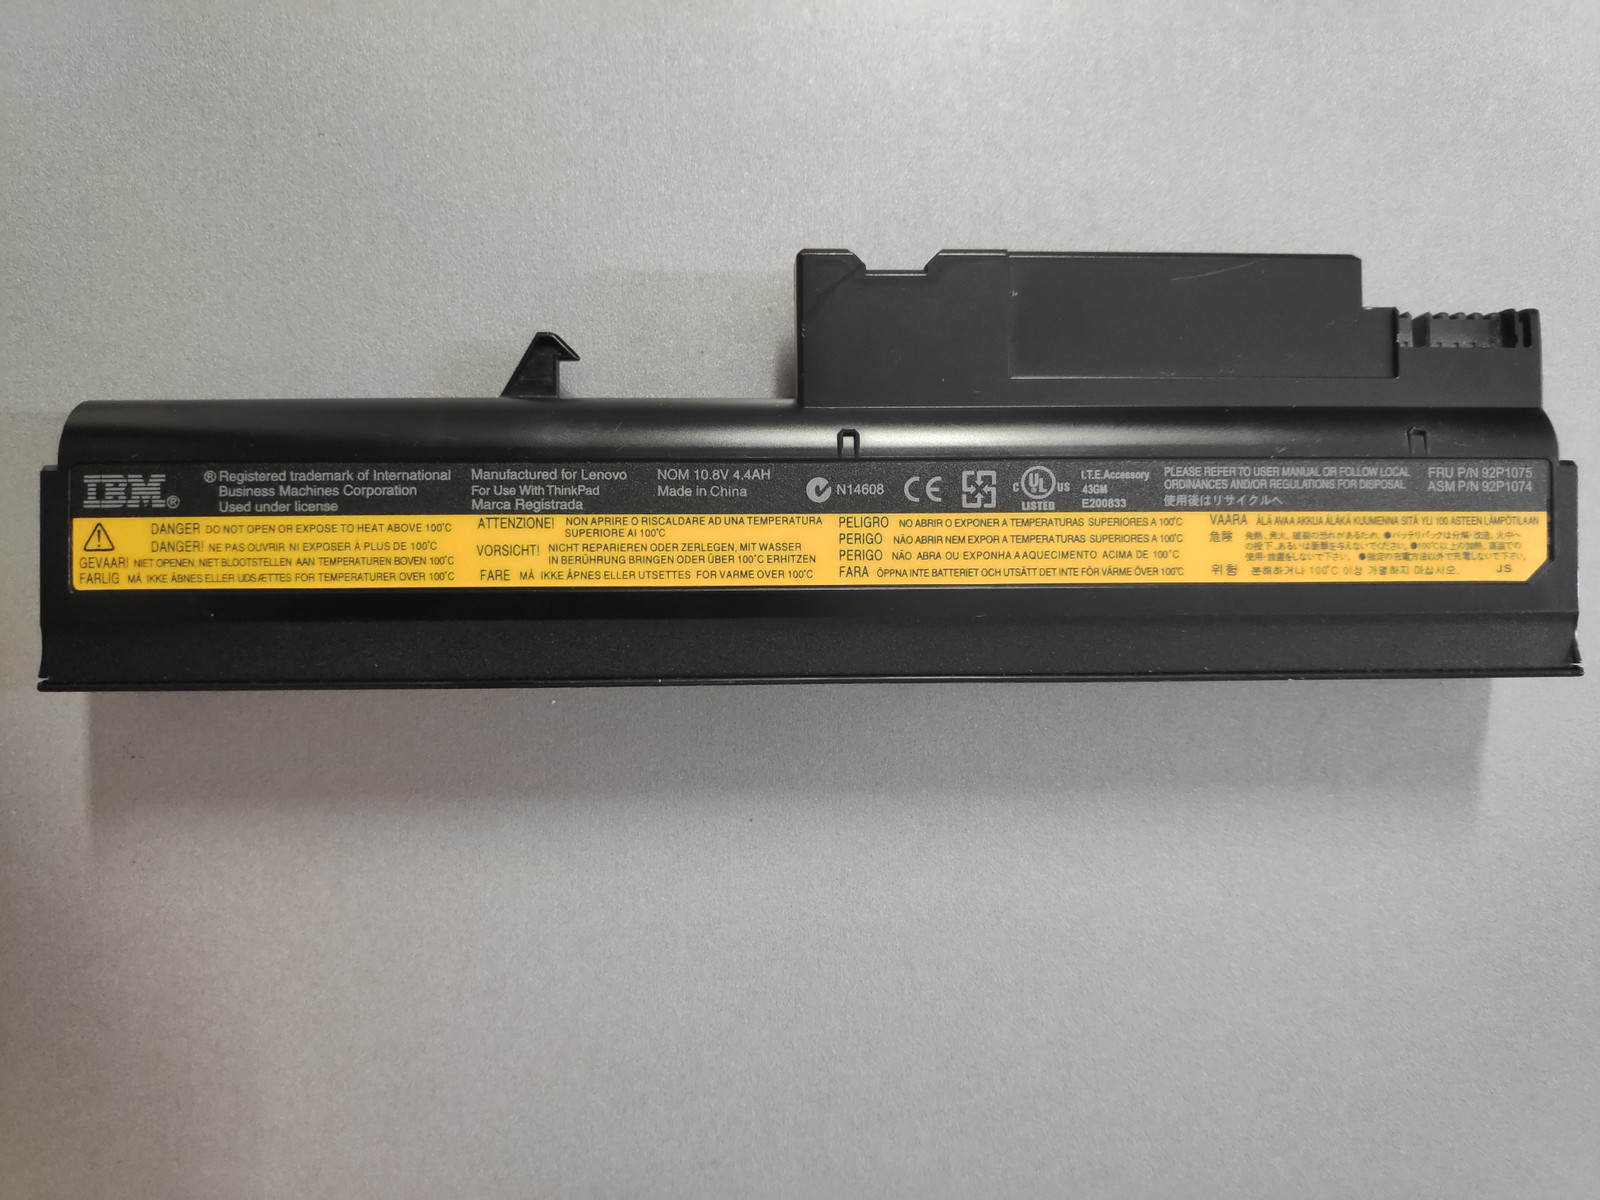 Psion mx3 med 2 stk 2mb flashdisker | FINN.no